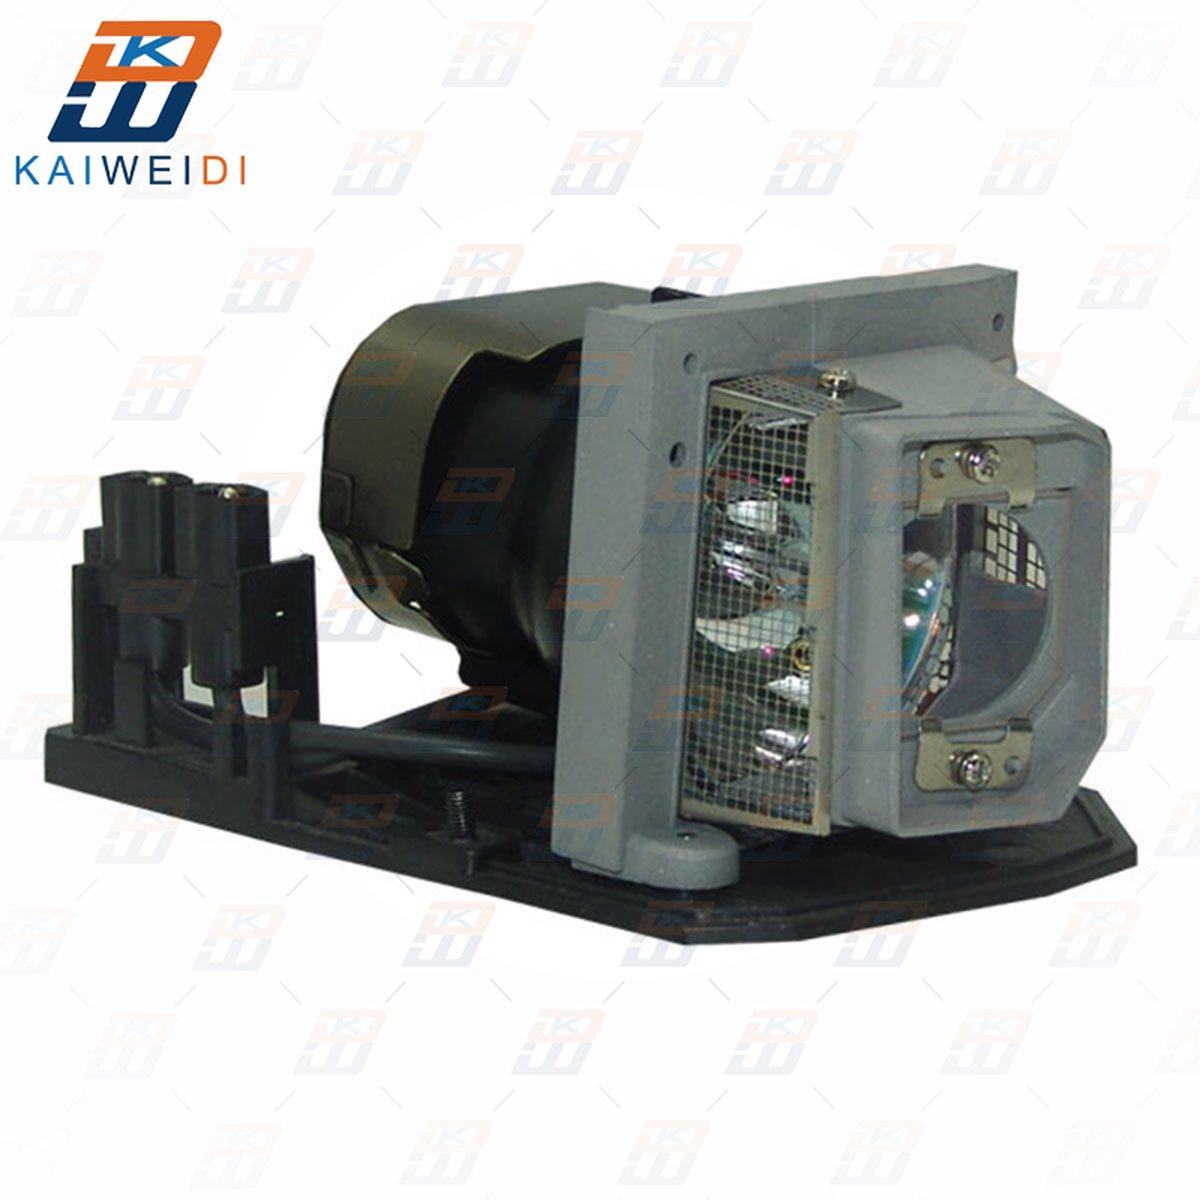 NP10LP NP100 NP100 + NP100A NP100G NP101 NP101G NP200 EDU NP200 NP200 + NP200A NP200G NP201 lámpara para proyector con vivienda para NEC